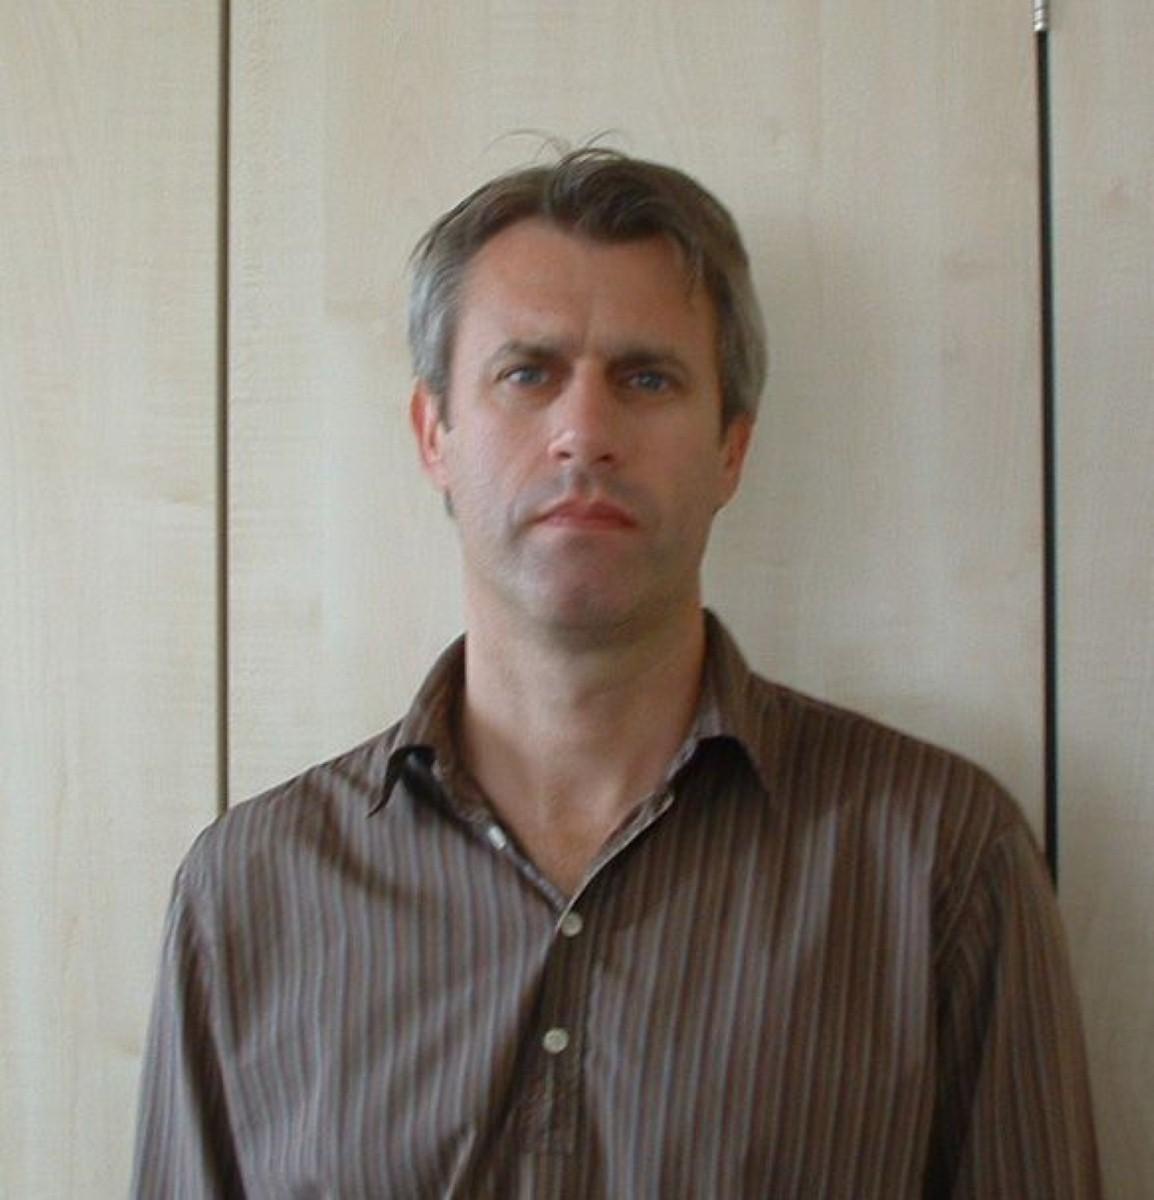 Allan Hogarth: 'The muzzling of Vanunu seems to be about revenge'